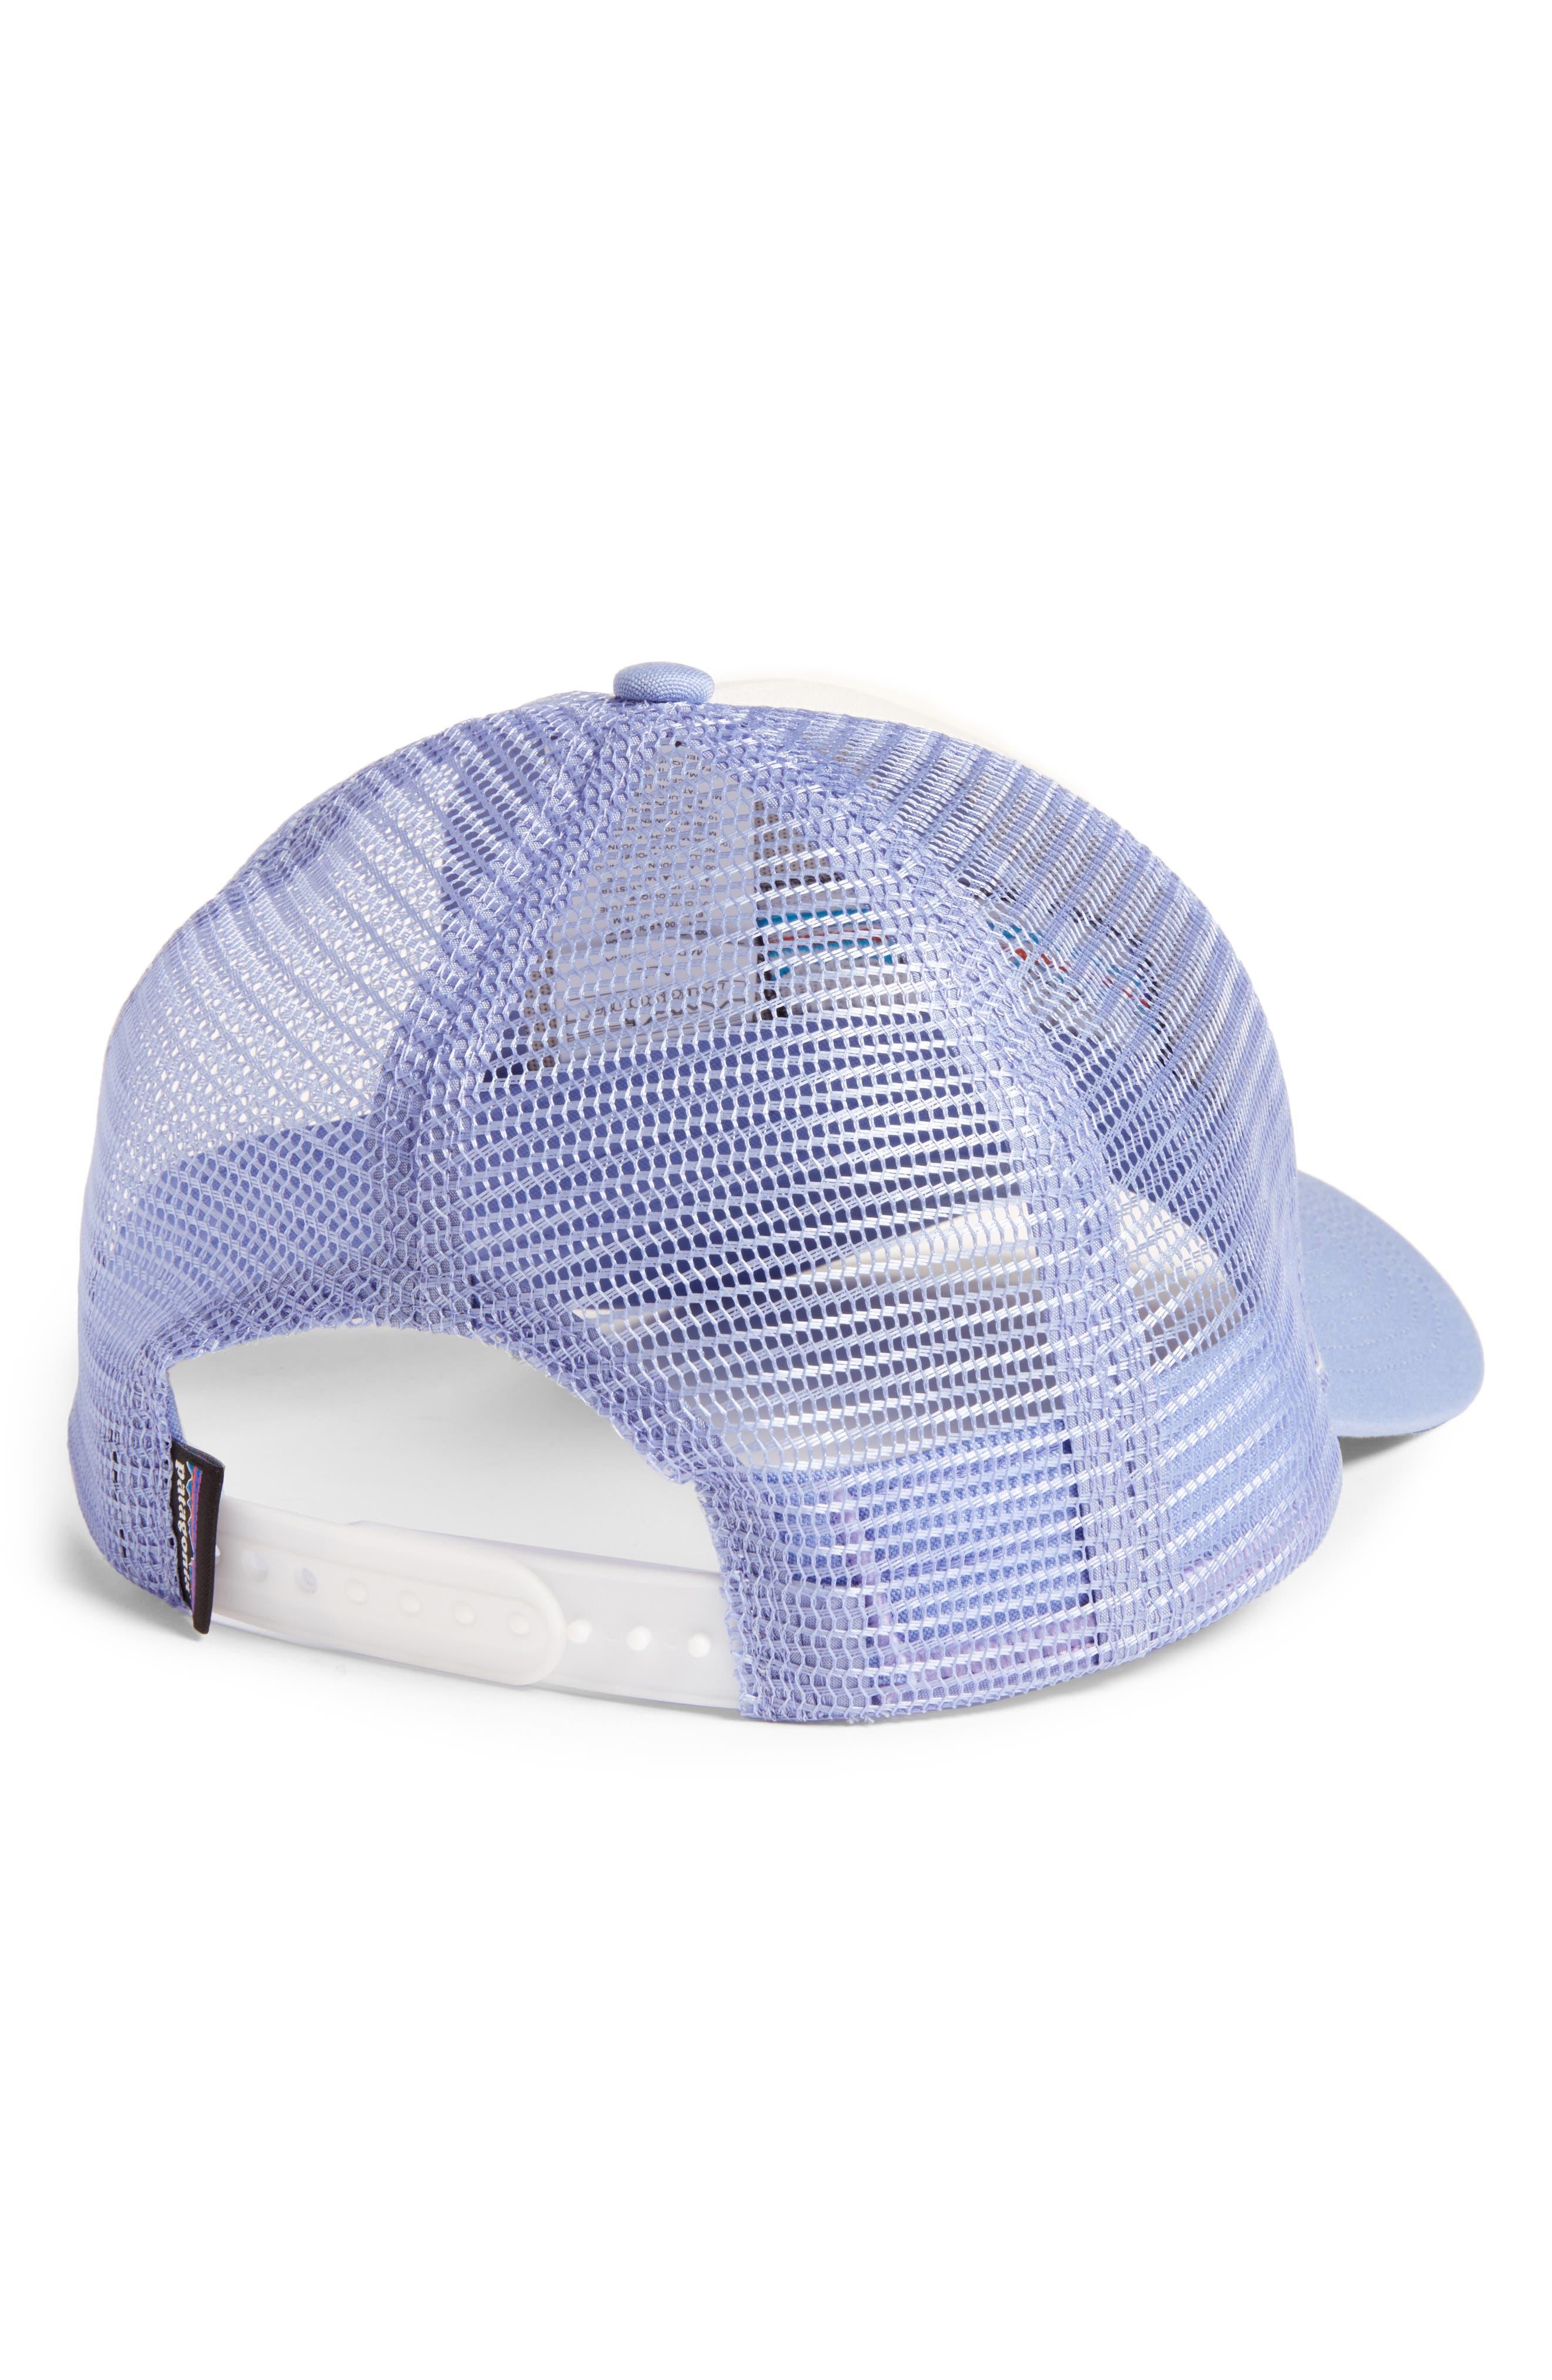 PATAGONIA, P6 LoPro Trucker Hat, Alternate thumbnail 2, color, WHITE W/ LIGHT VIOLET BLUE